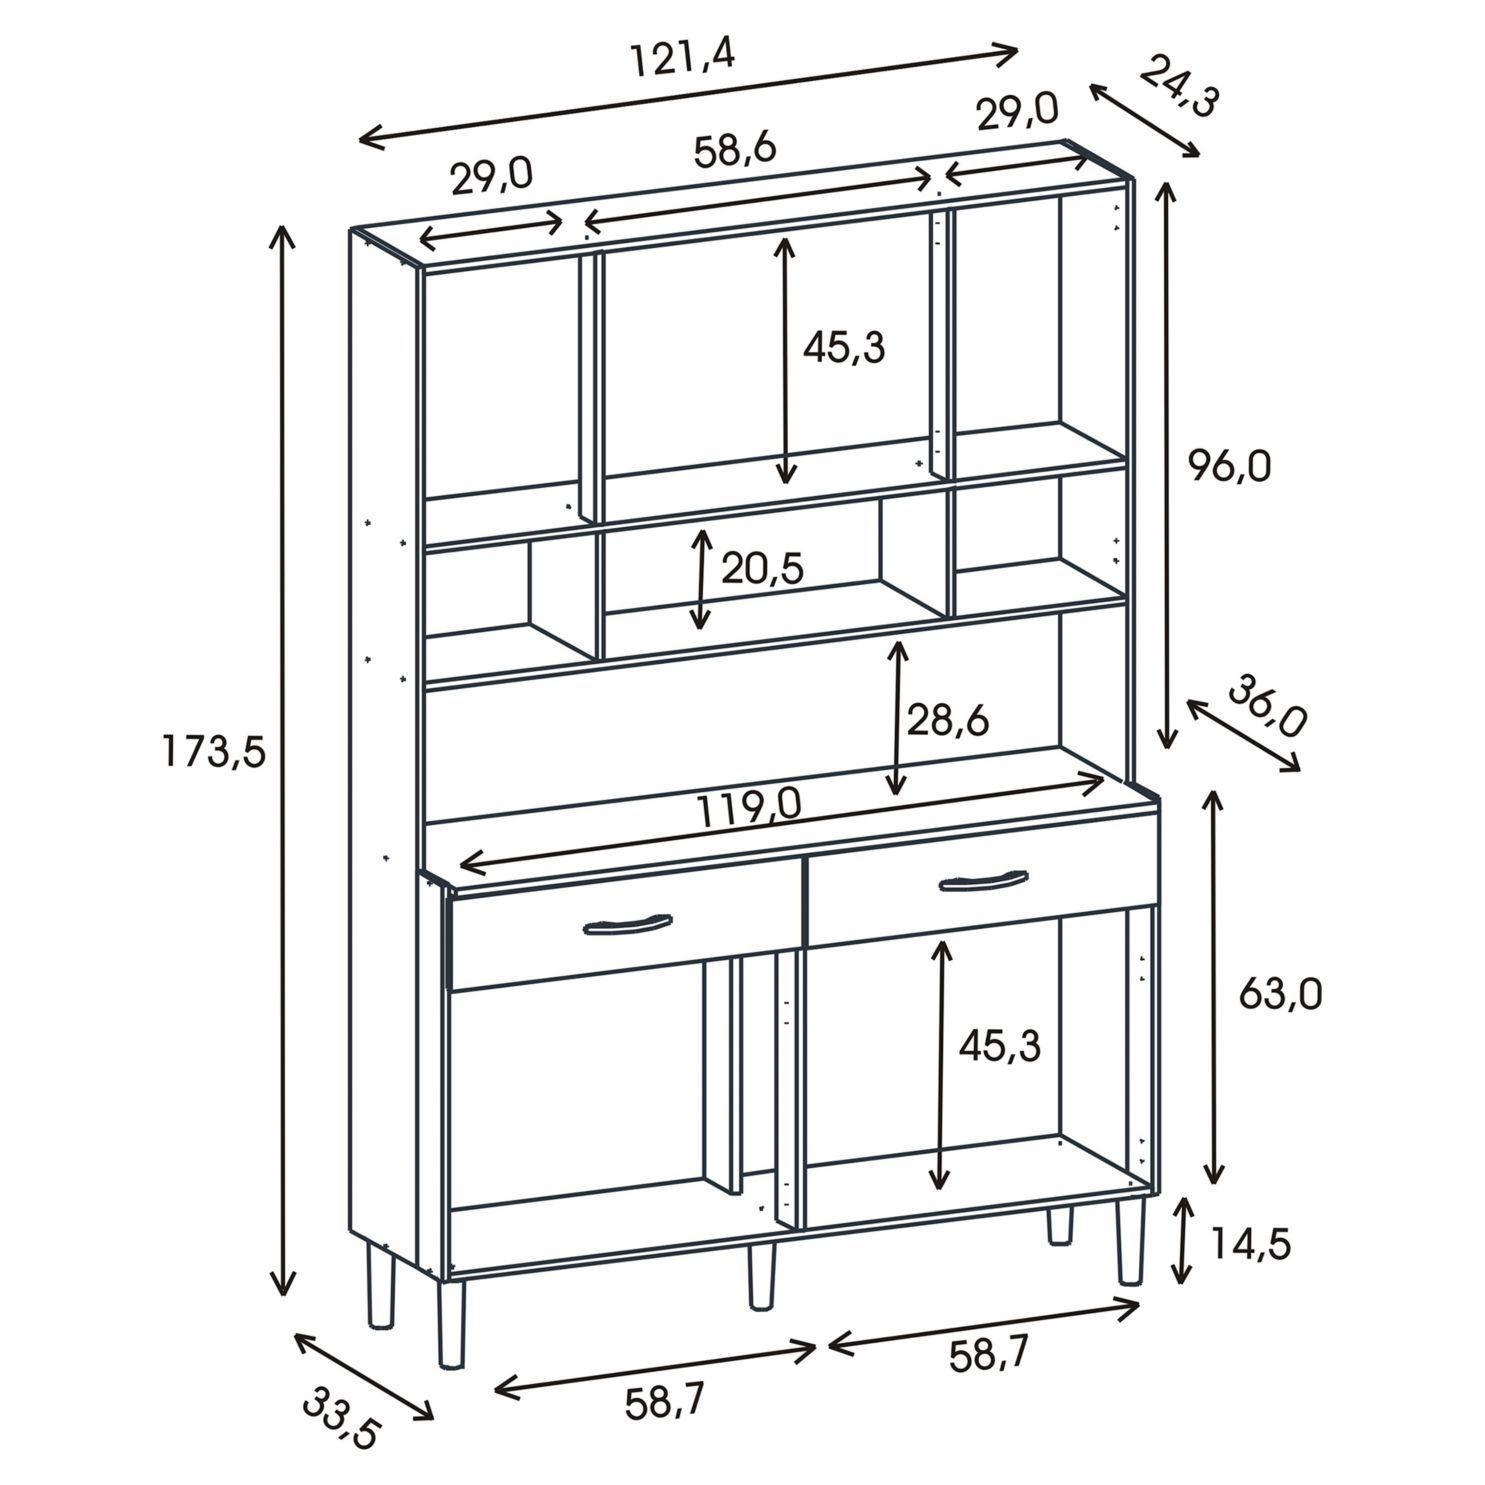 Kit mueble cocina 121x174x36 cm Blanco | medidas muebles ...